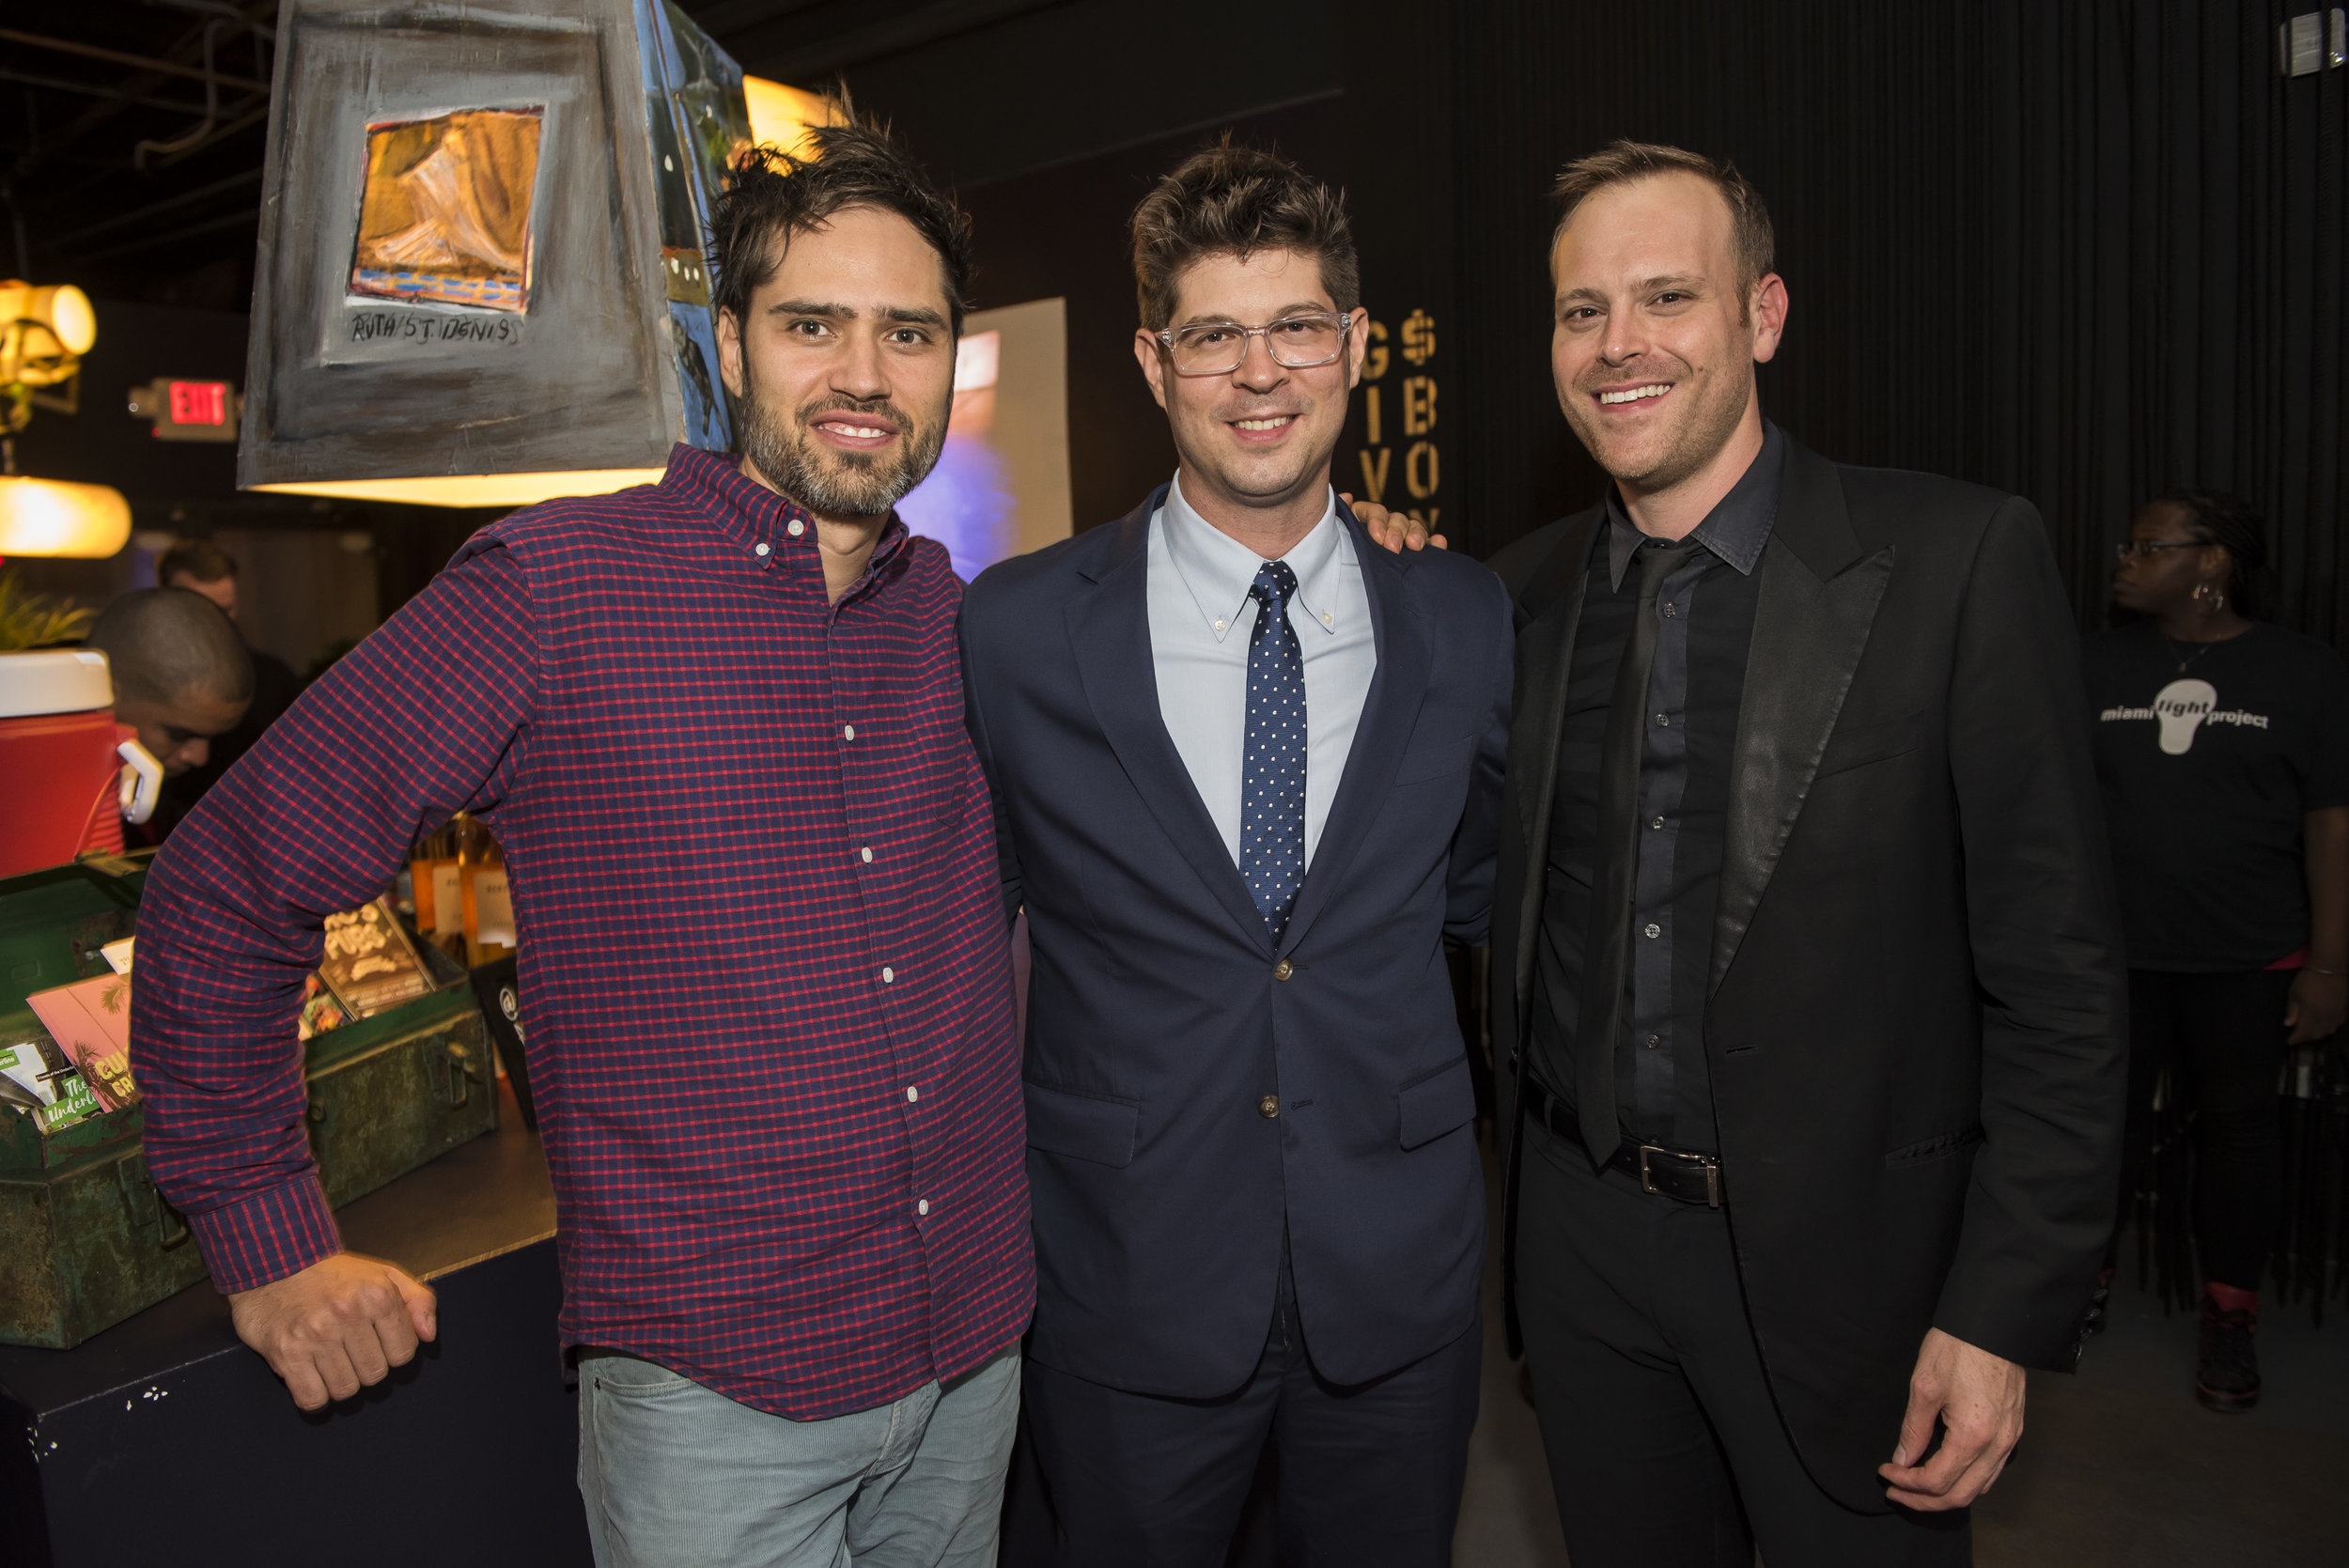 From Left to Right: William Brittelle, Adam Schoenberg, Aaron Merritt Photo Credit: Alex Markow Photography